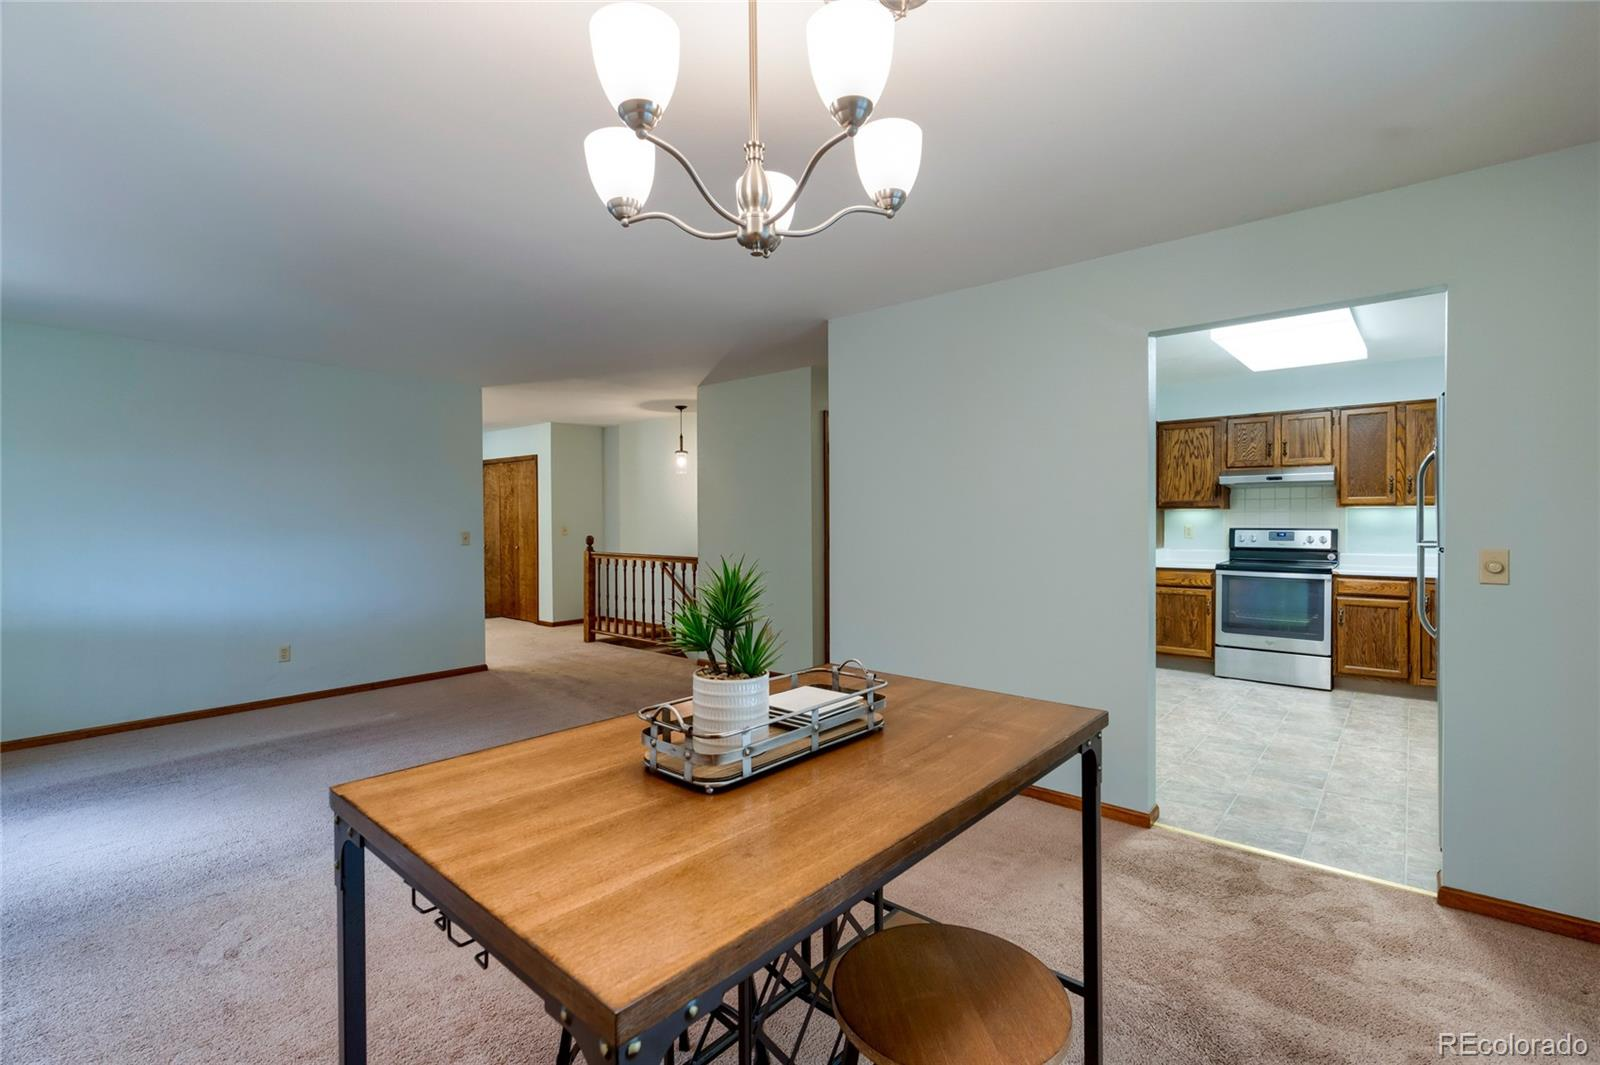 MLS# 6009976 - 4 - 720 Arbor Avenue #16, Fort Collins, CO 80526